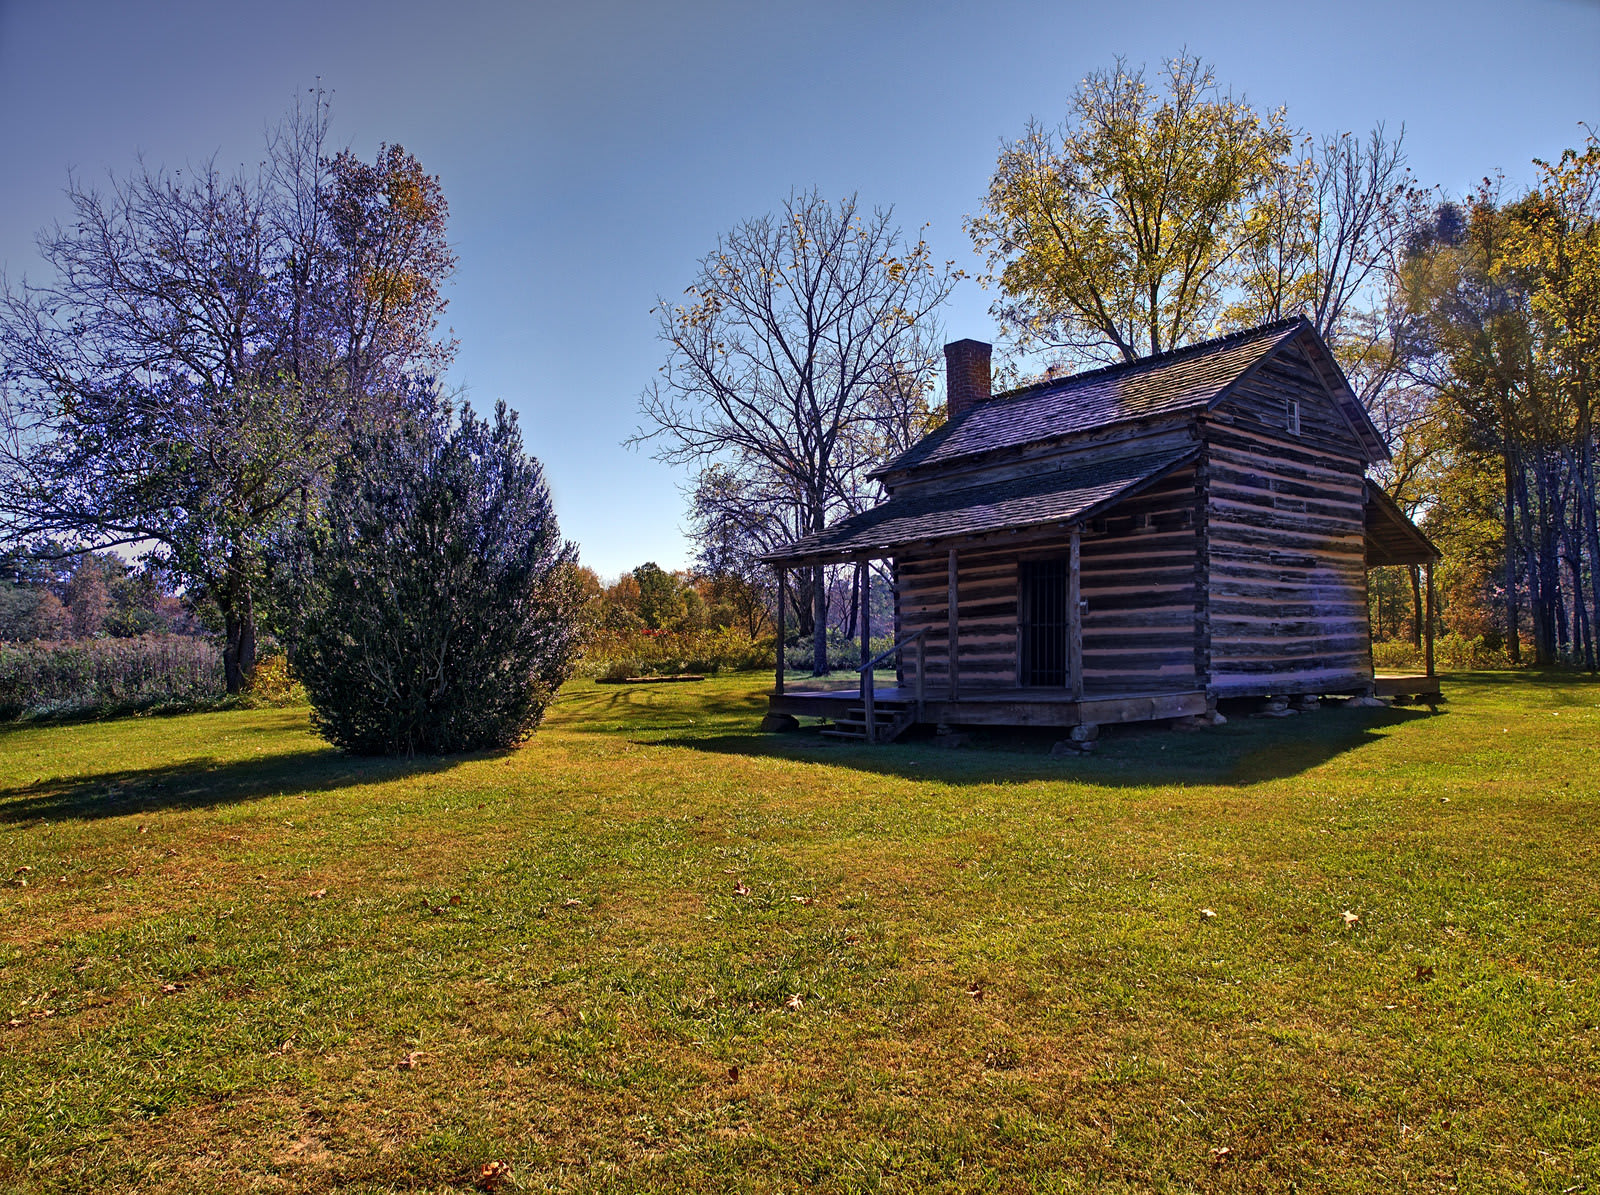 Cowpens National Battlefield South Carolina